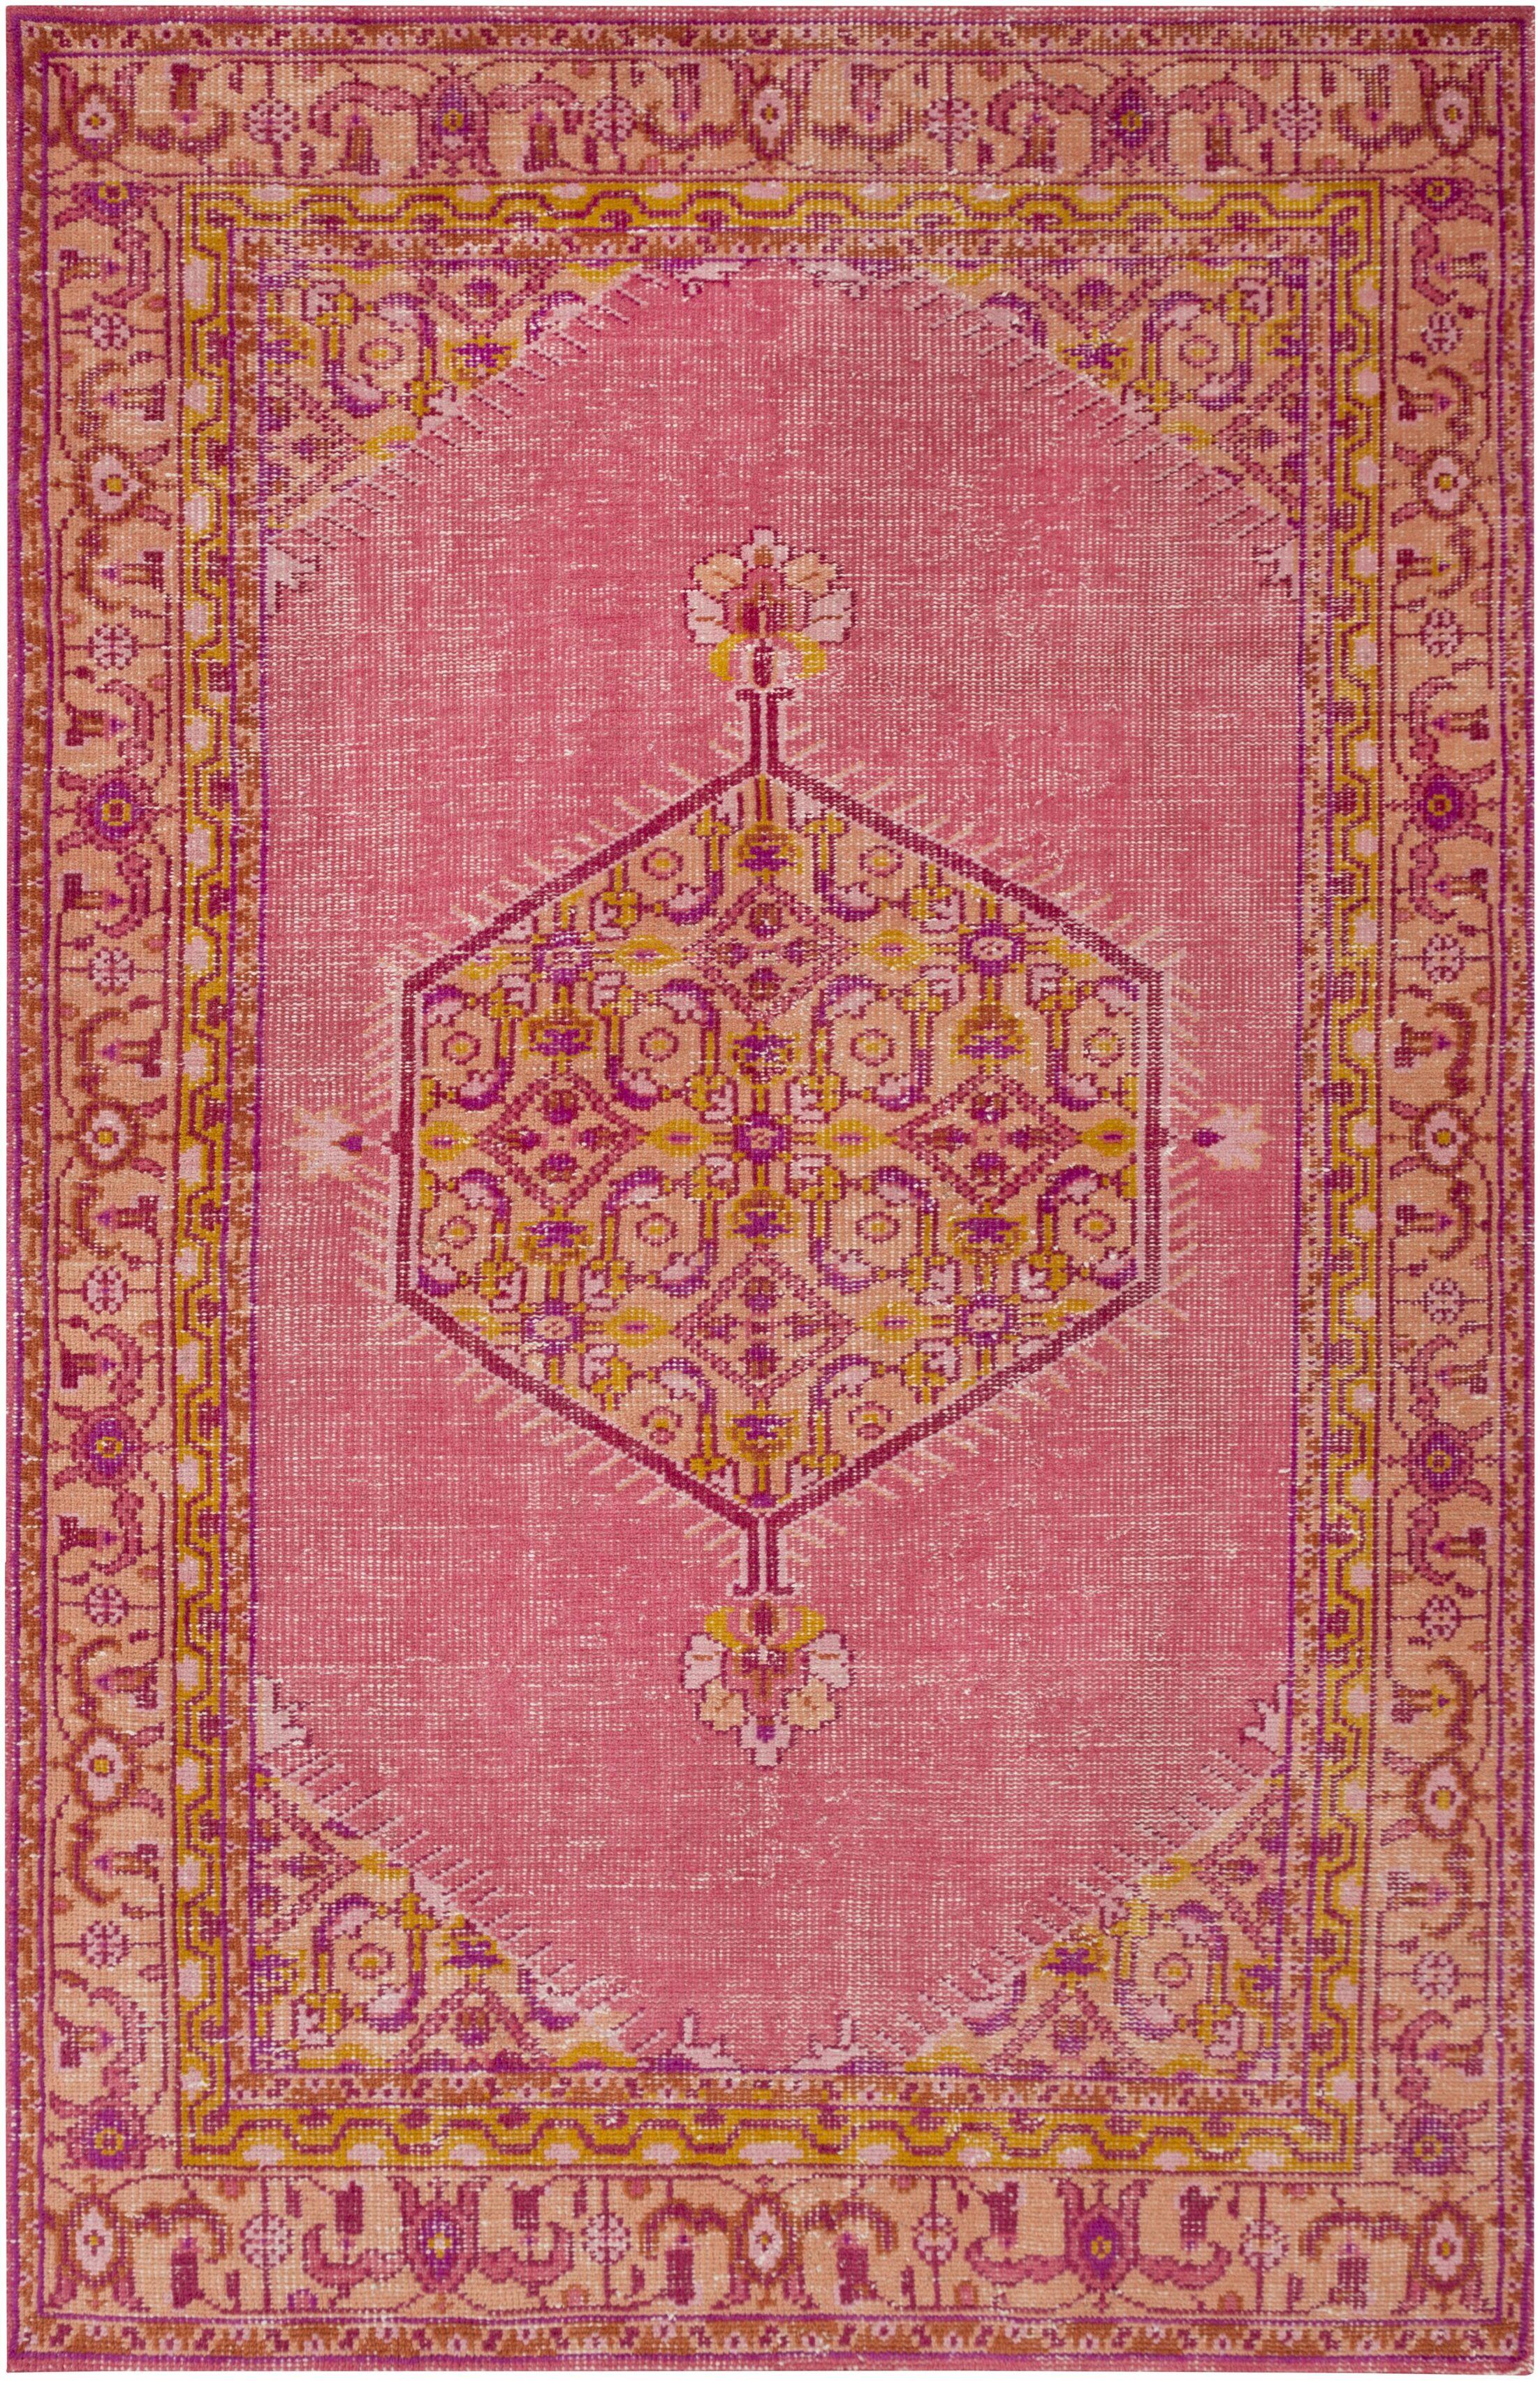 Blackshear Hot Pink/Gold Oriental Area Rug Rug Size: Rectangle 2' x 3'